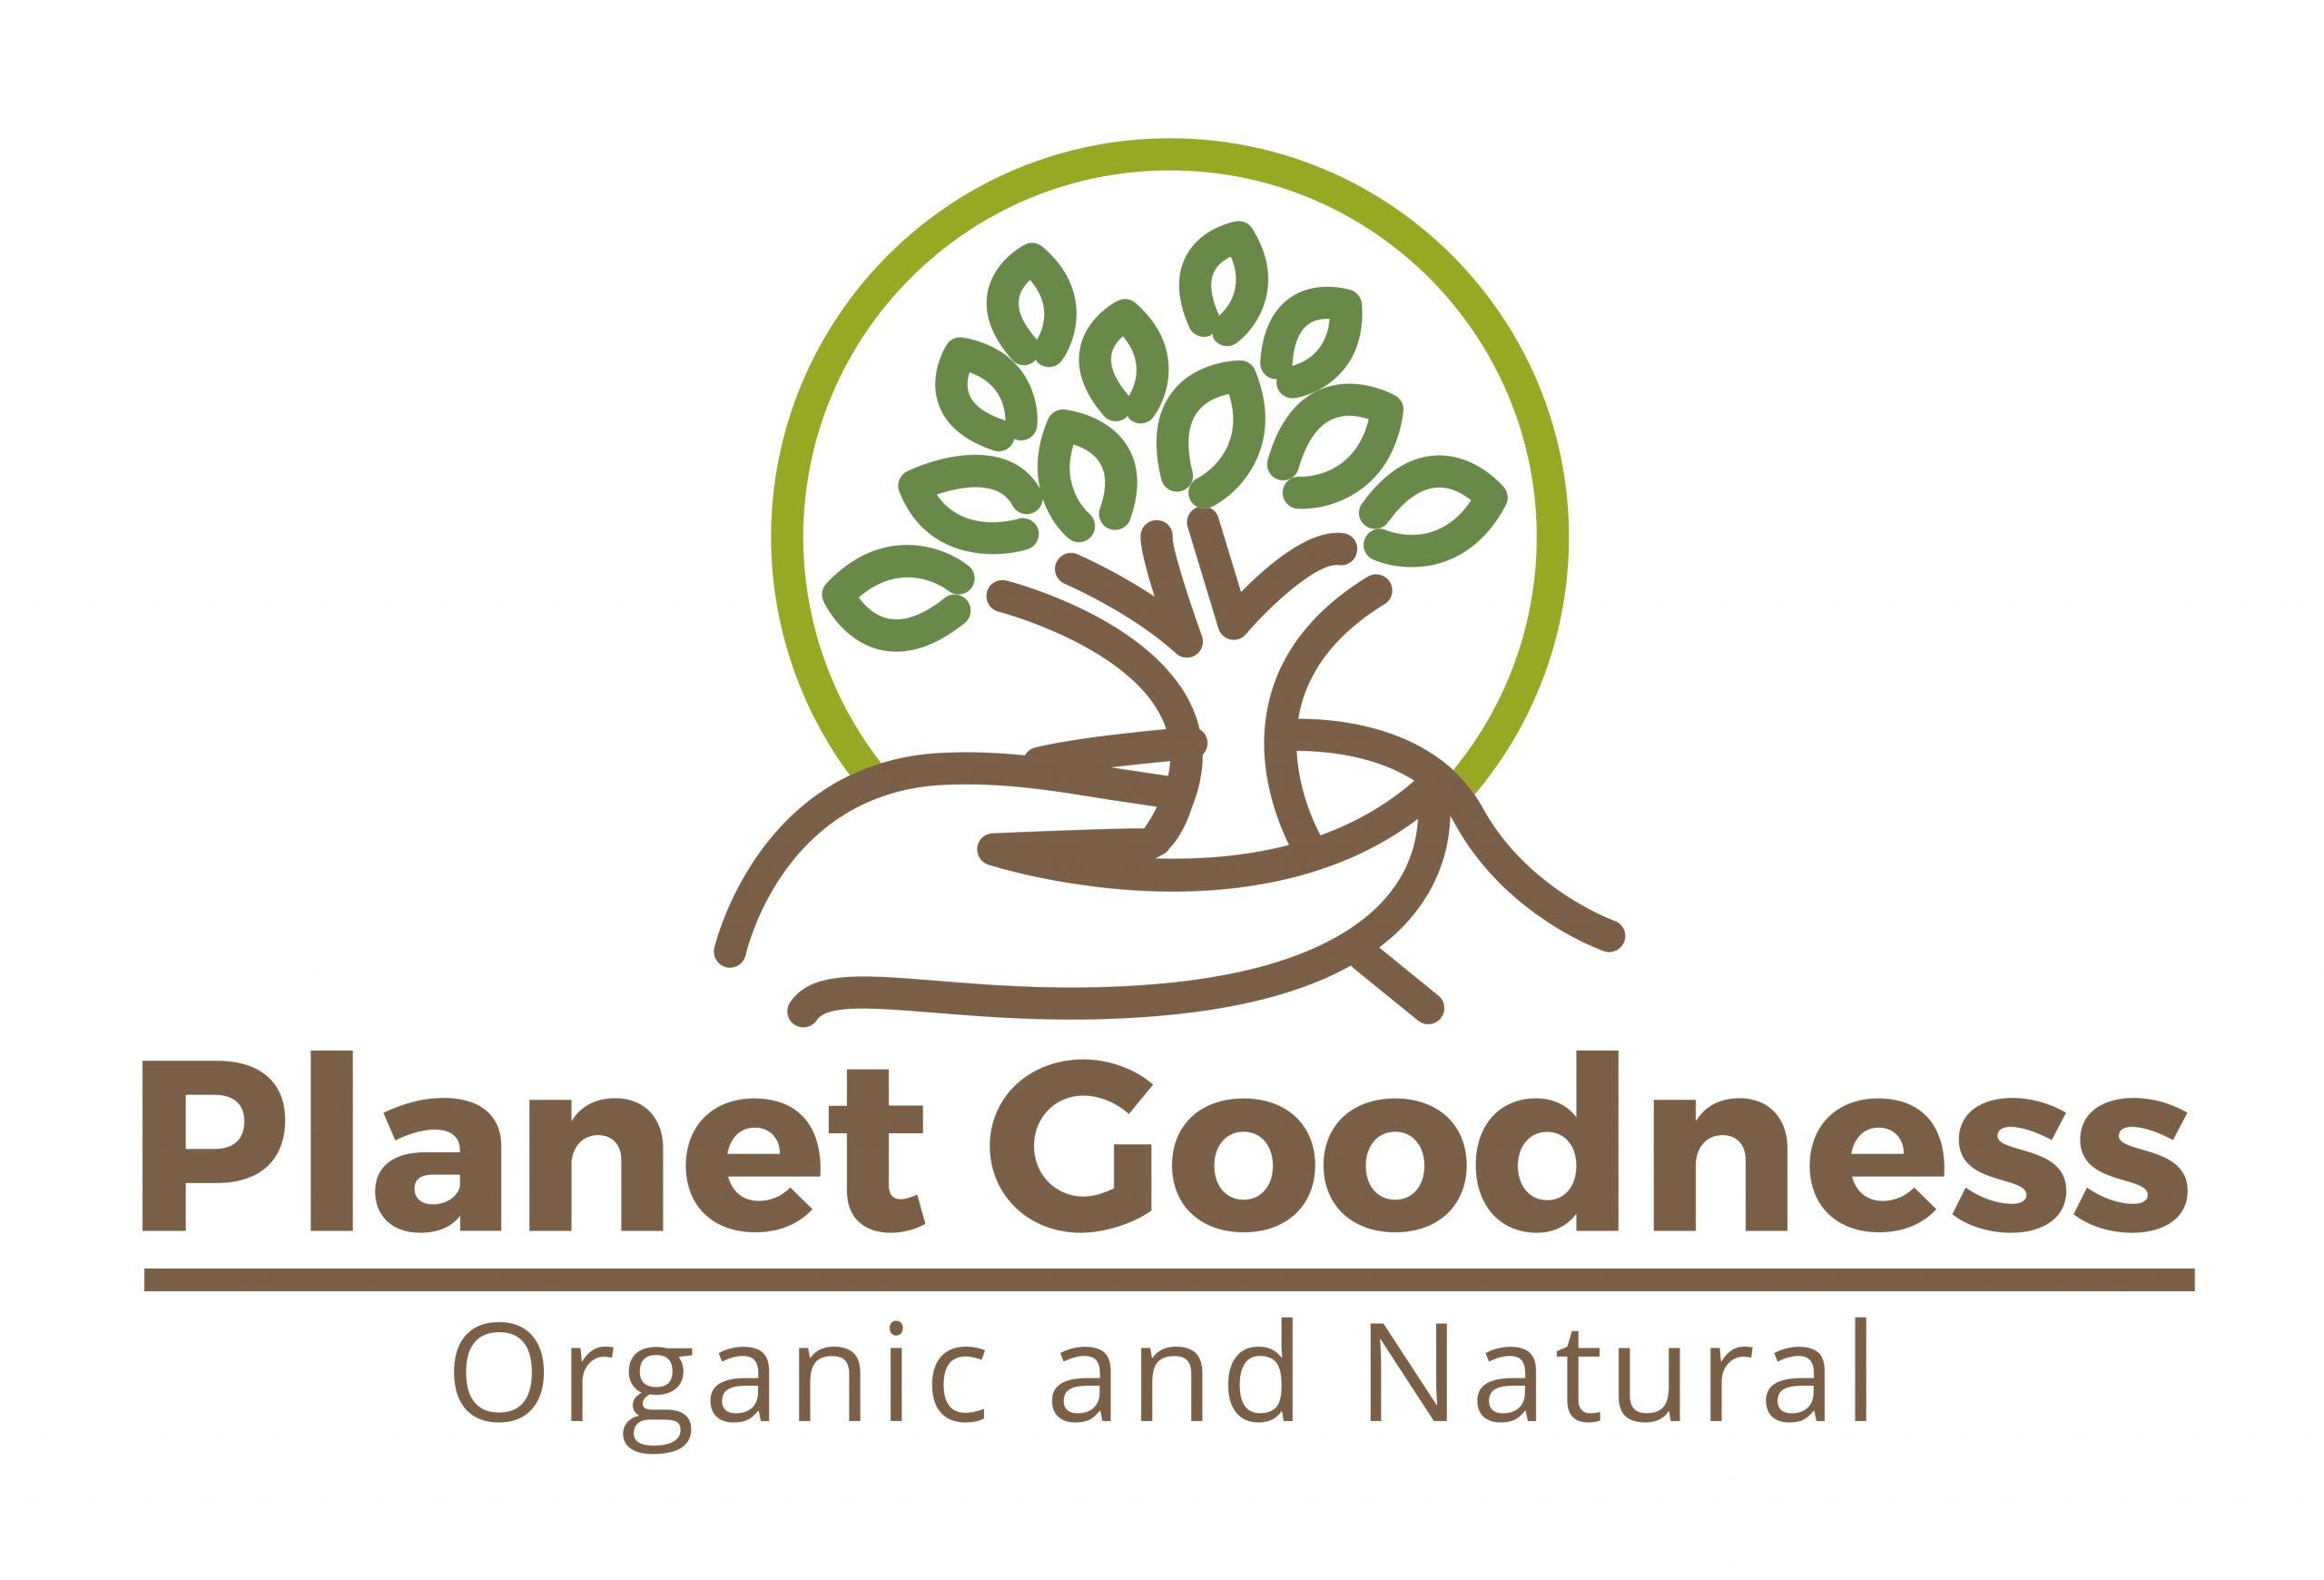 Planet Goodness